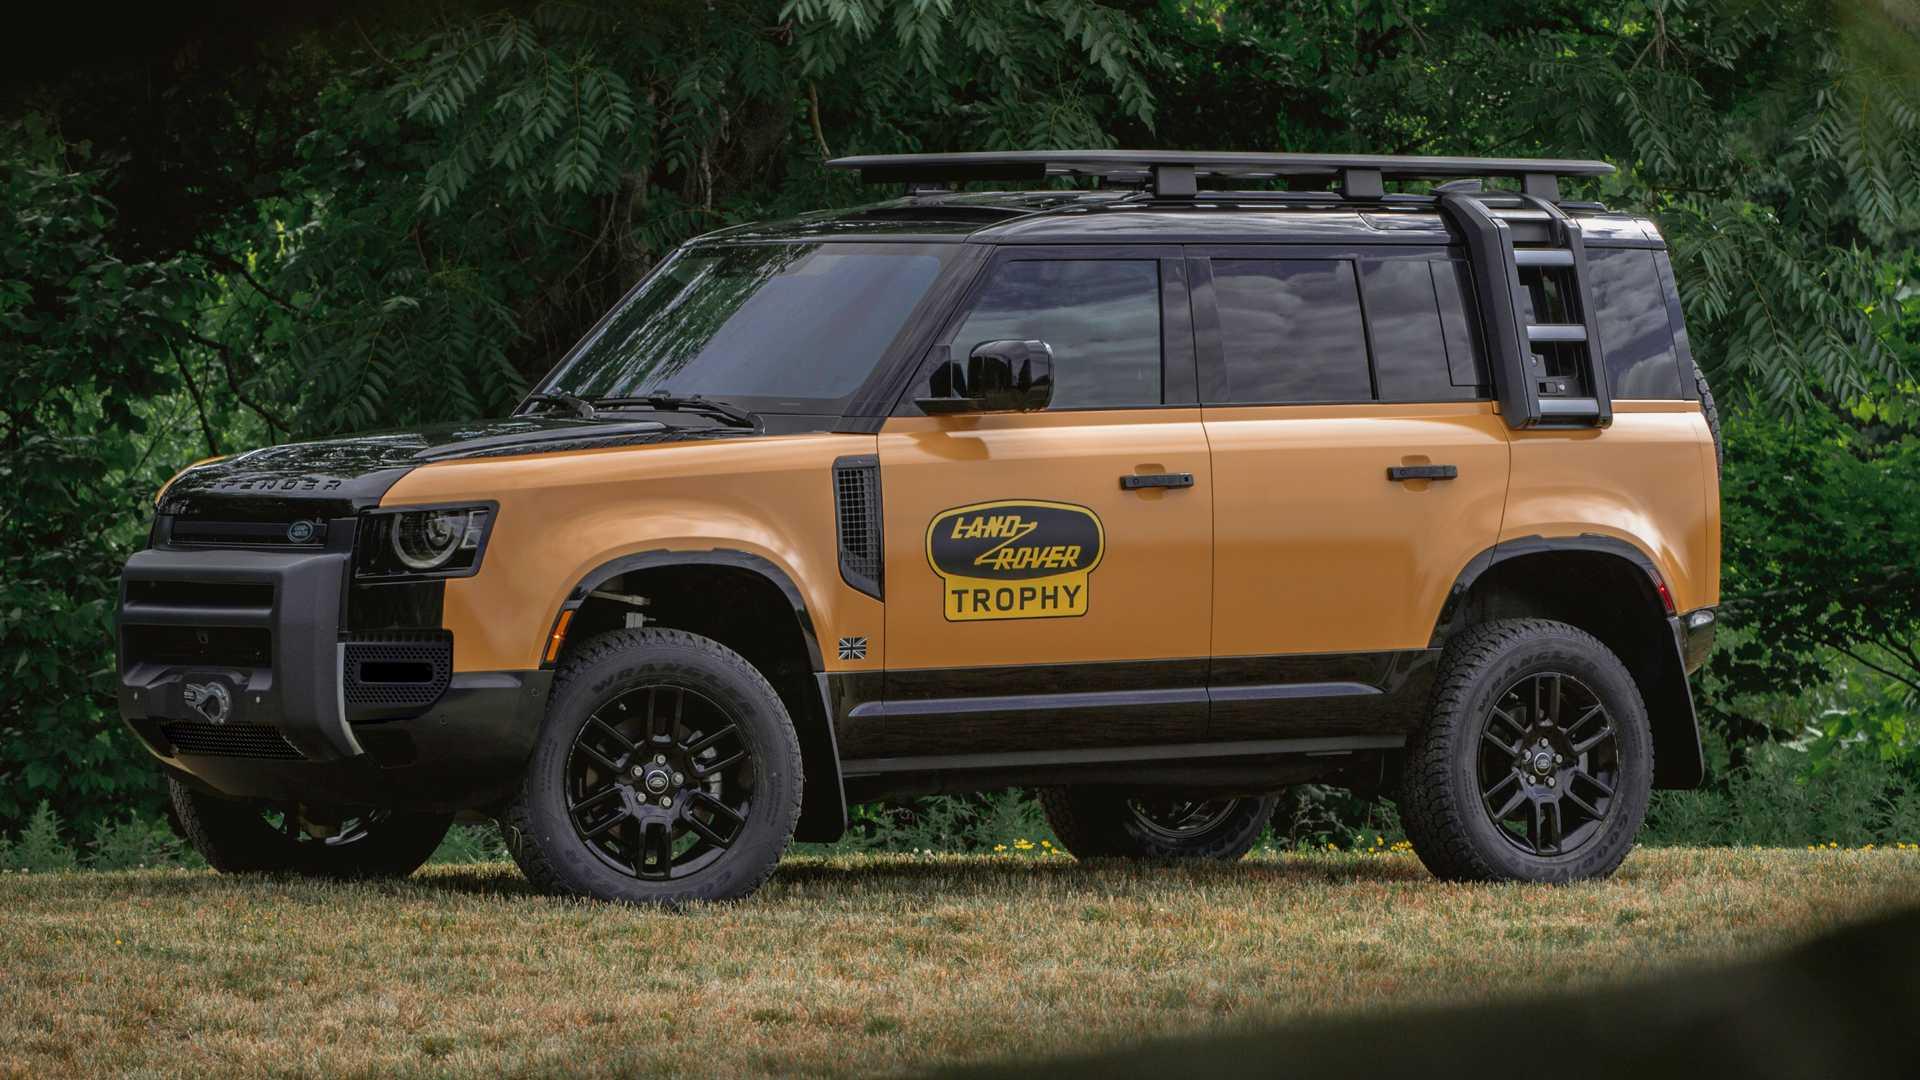 Land-Rover-Defender-Trophy-Edition-1